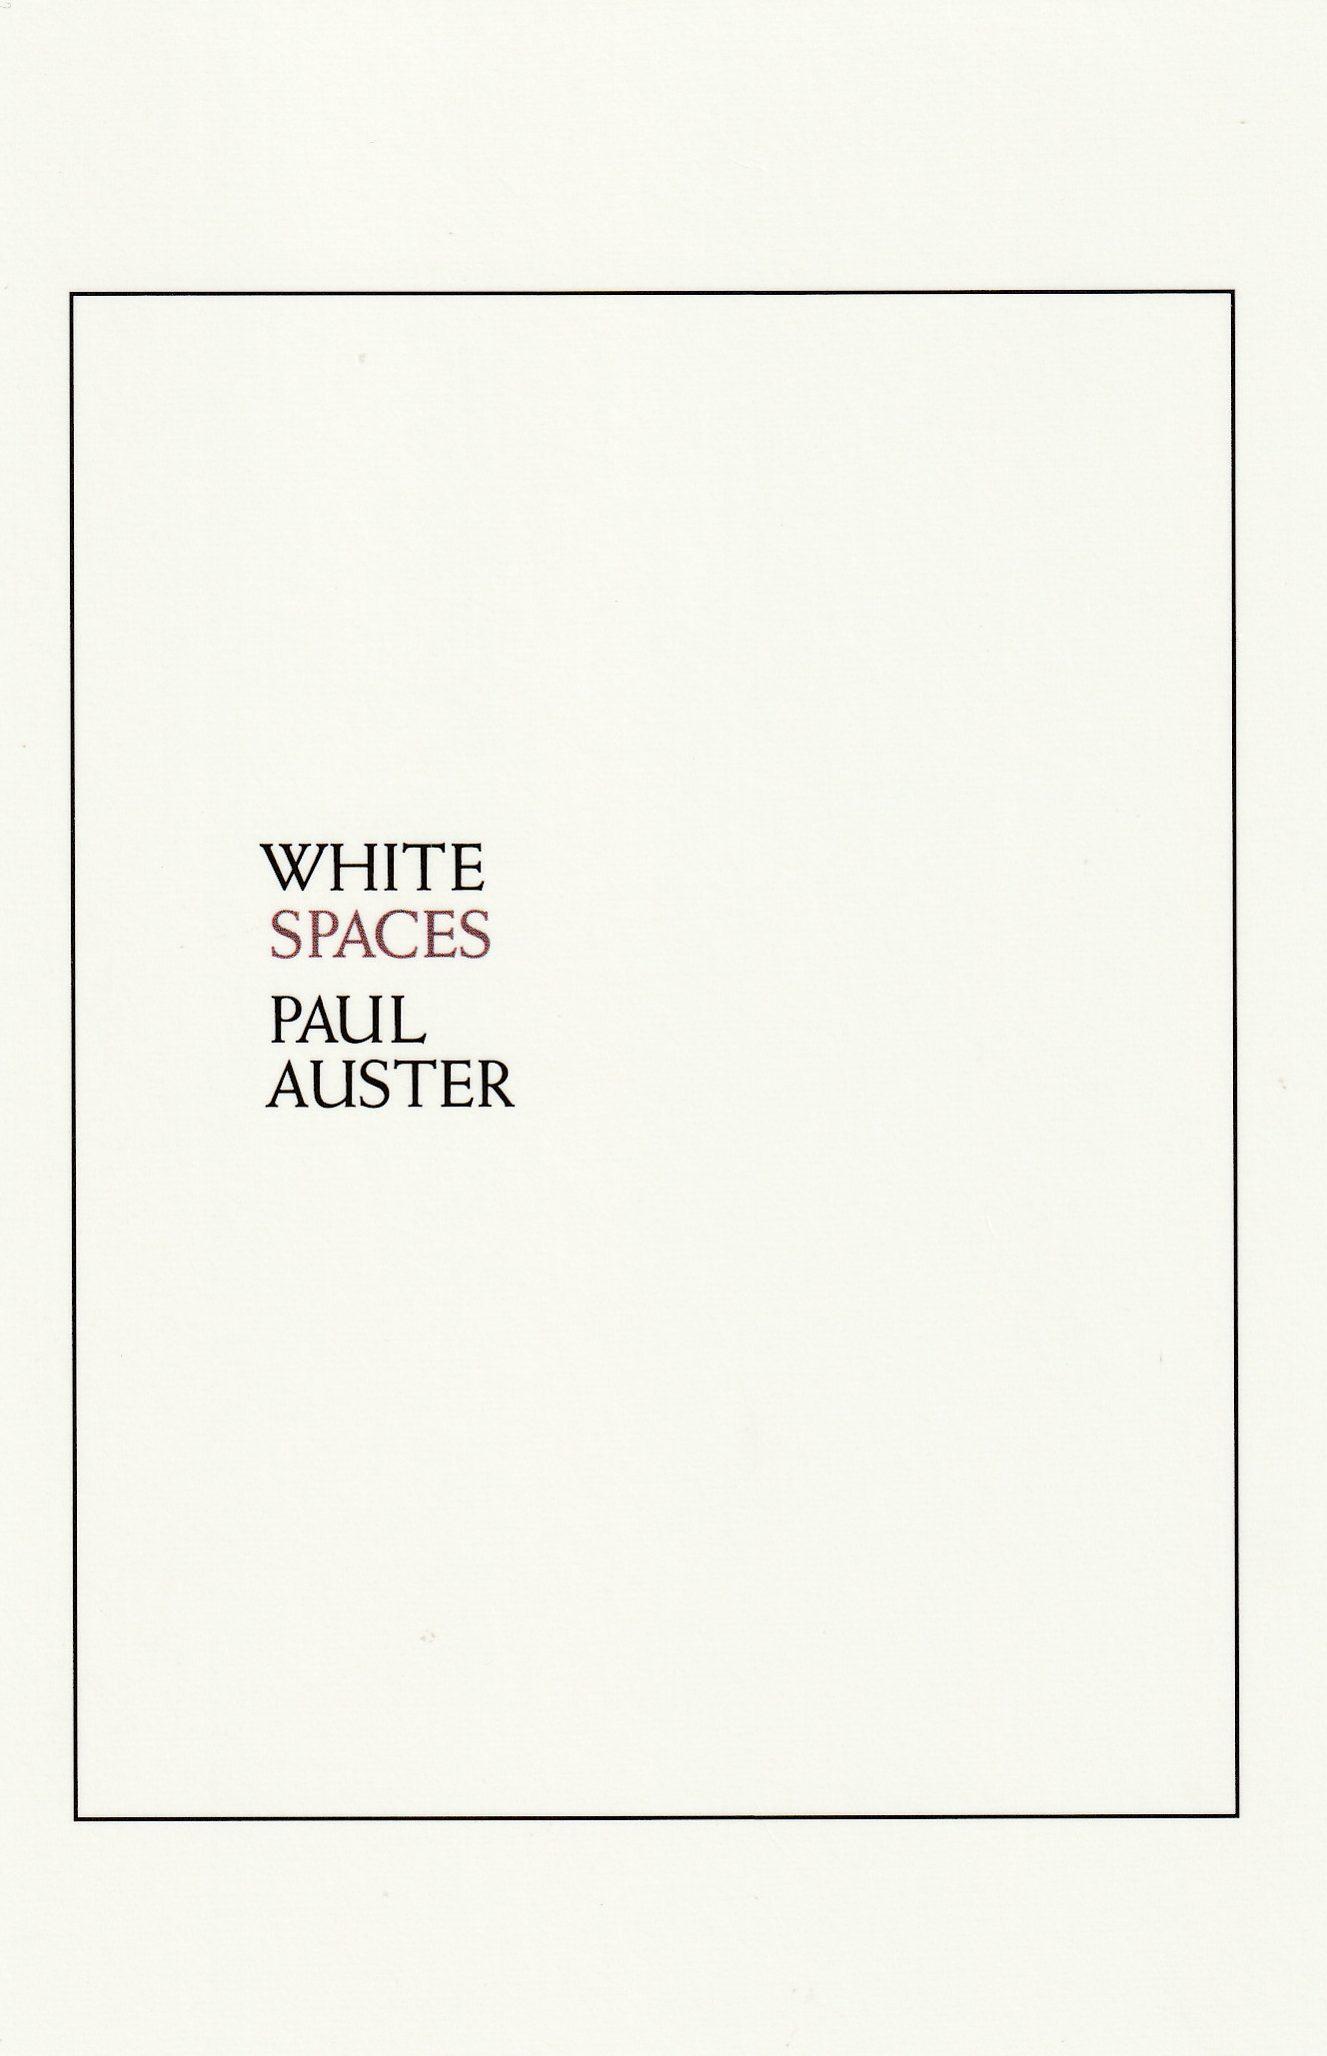 Paul Auster — <i>White Spaces</i>